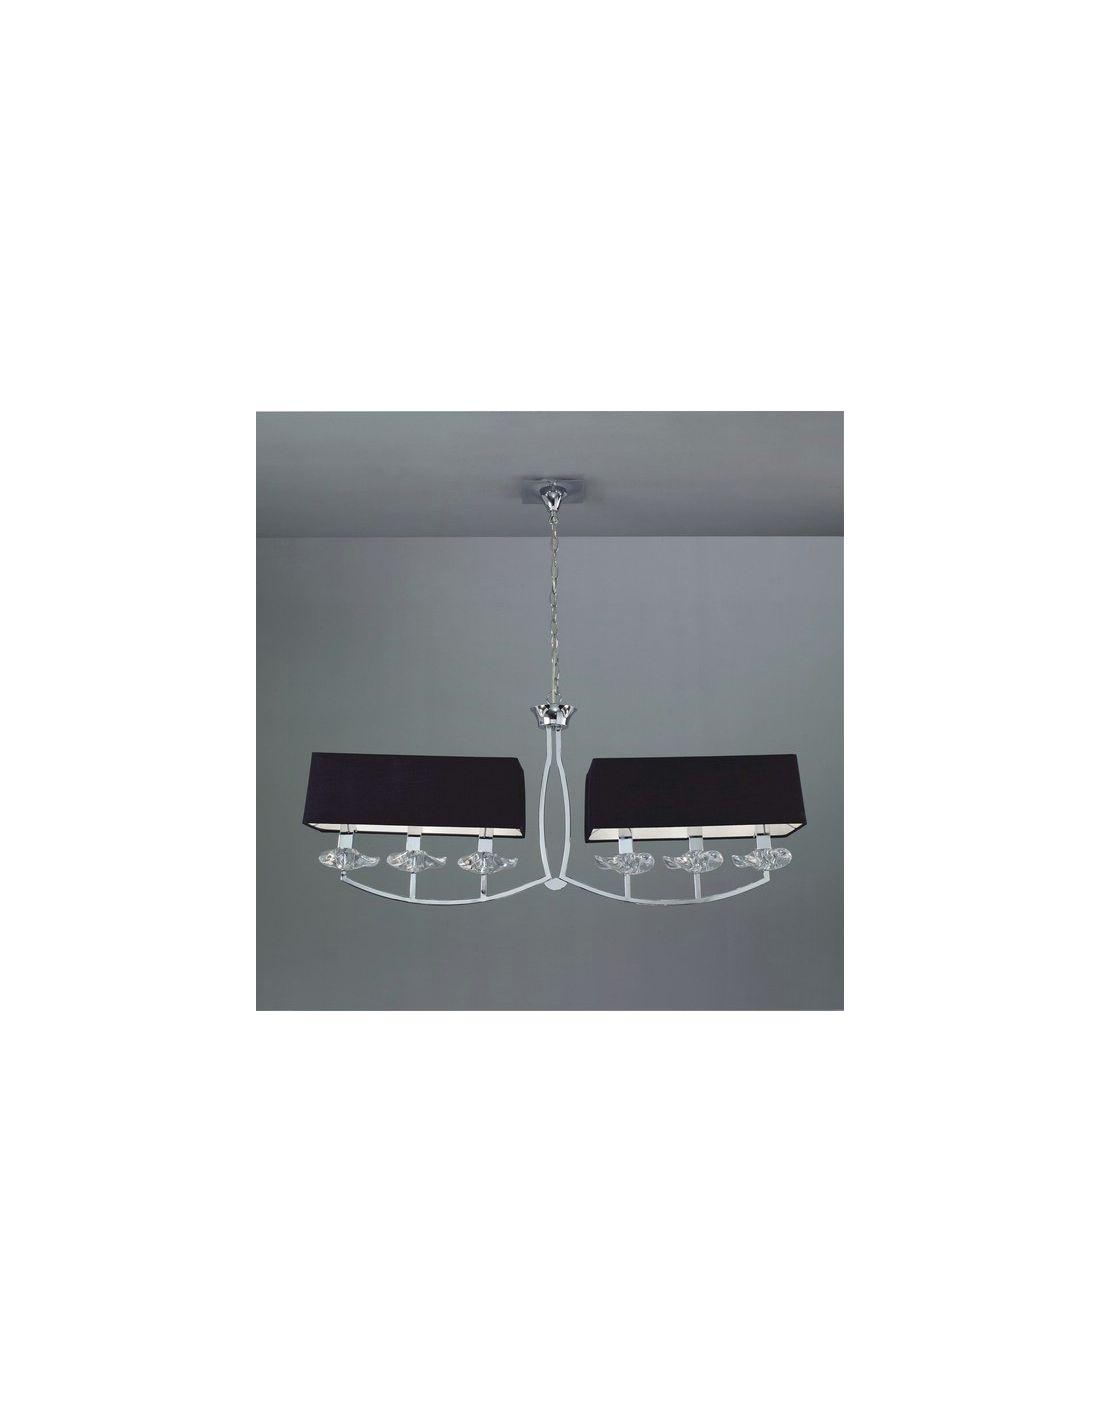 Lamparas lamparas modernas lamparas de techo modernas - Lamparas techo modernas ...